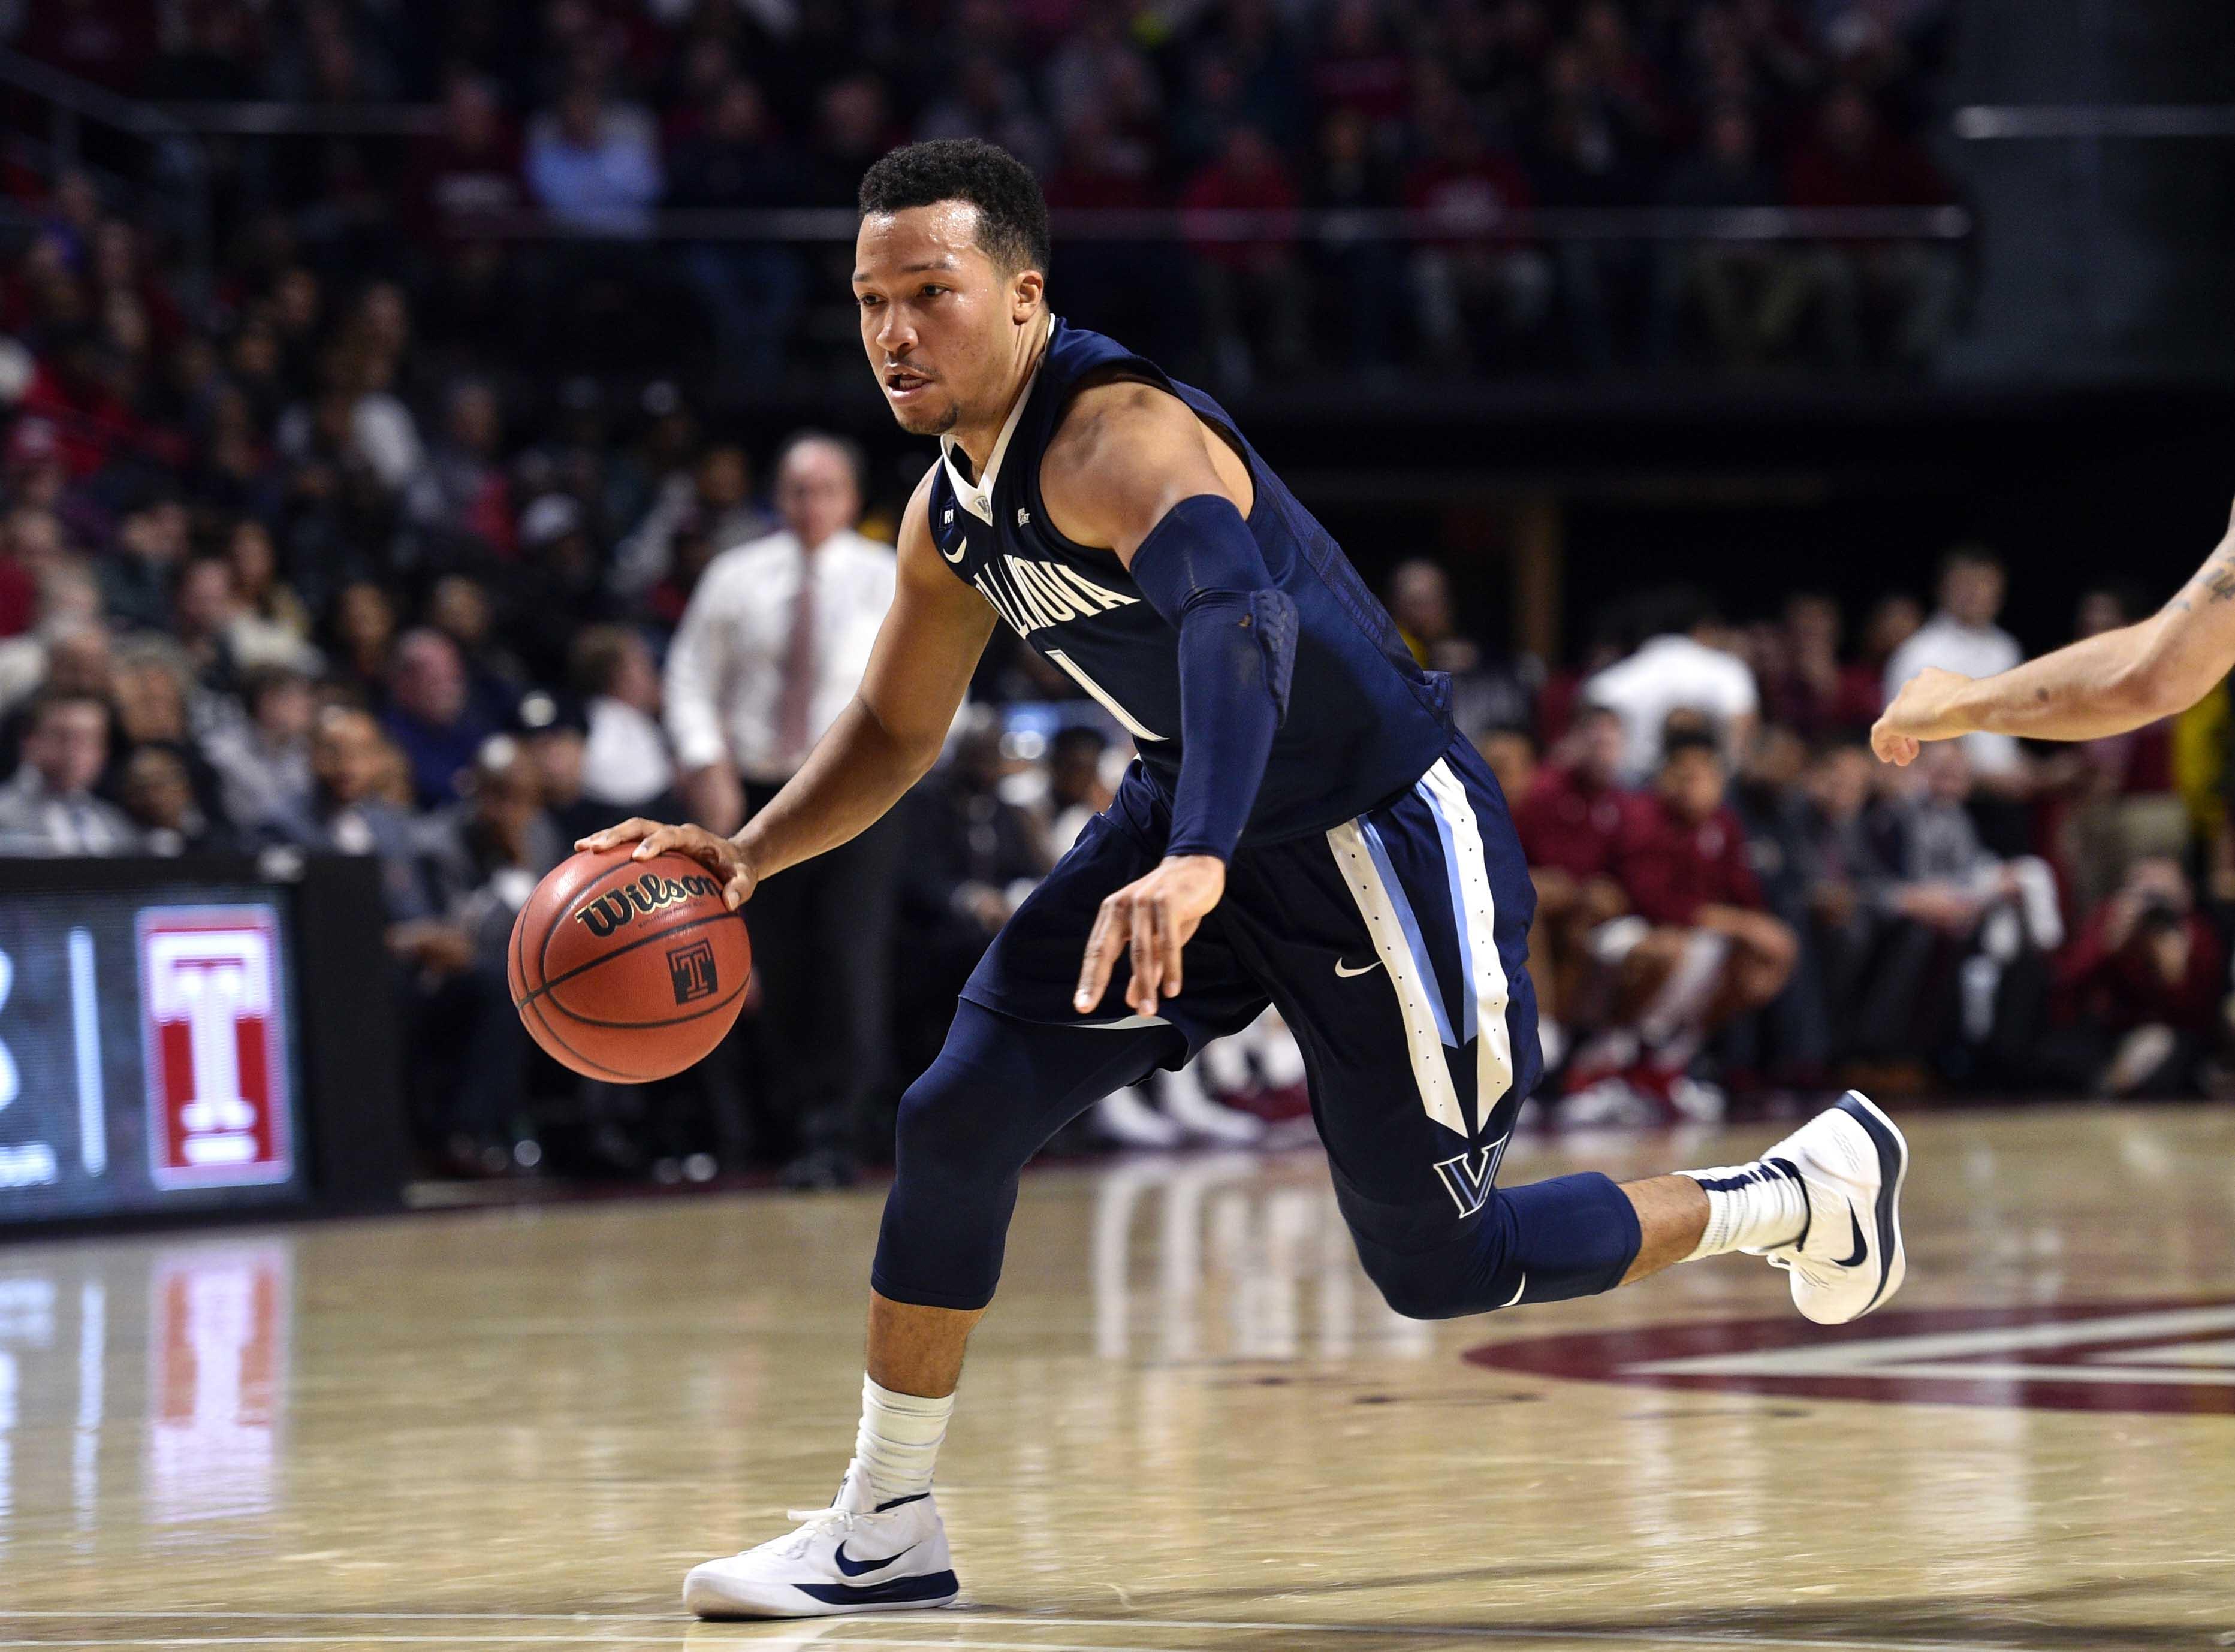 NCAA Basketball: Villanova at Temple